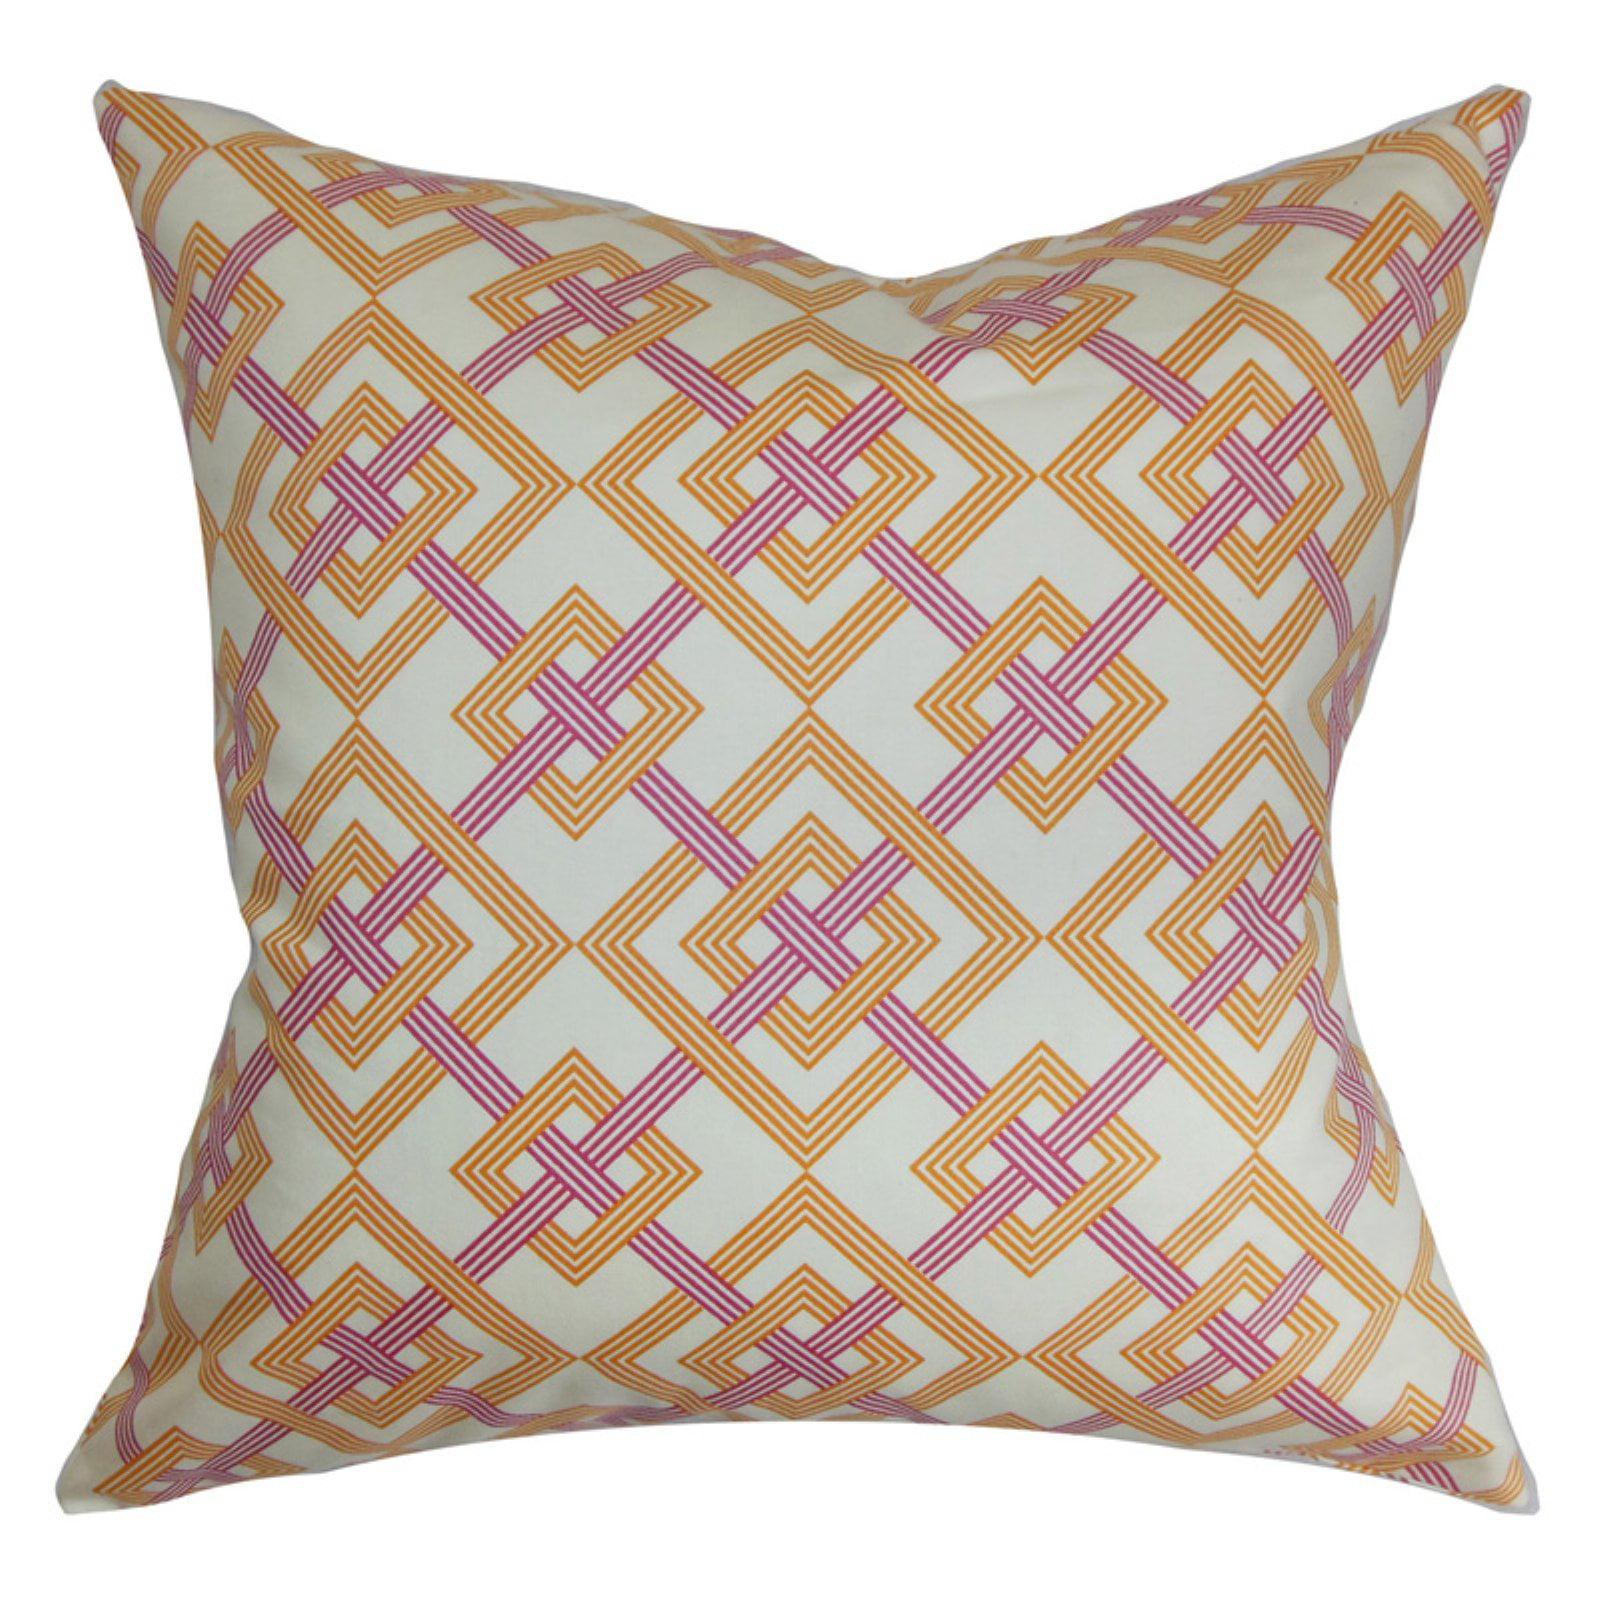 The Pillow Collection Fimbrethil Geometric Pillow - Orange Purple